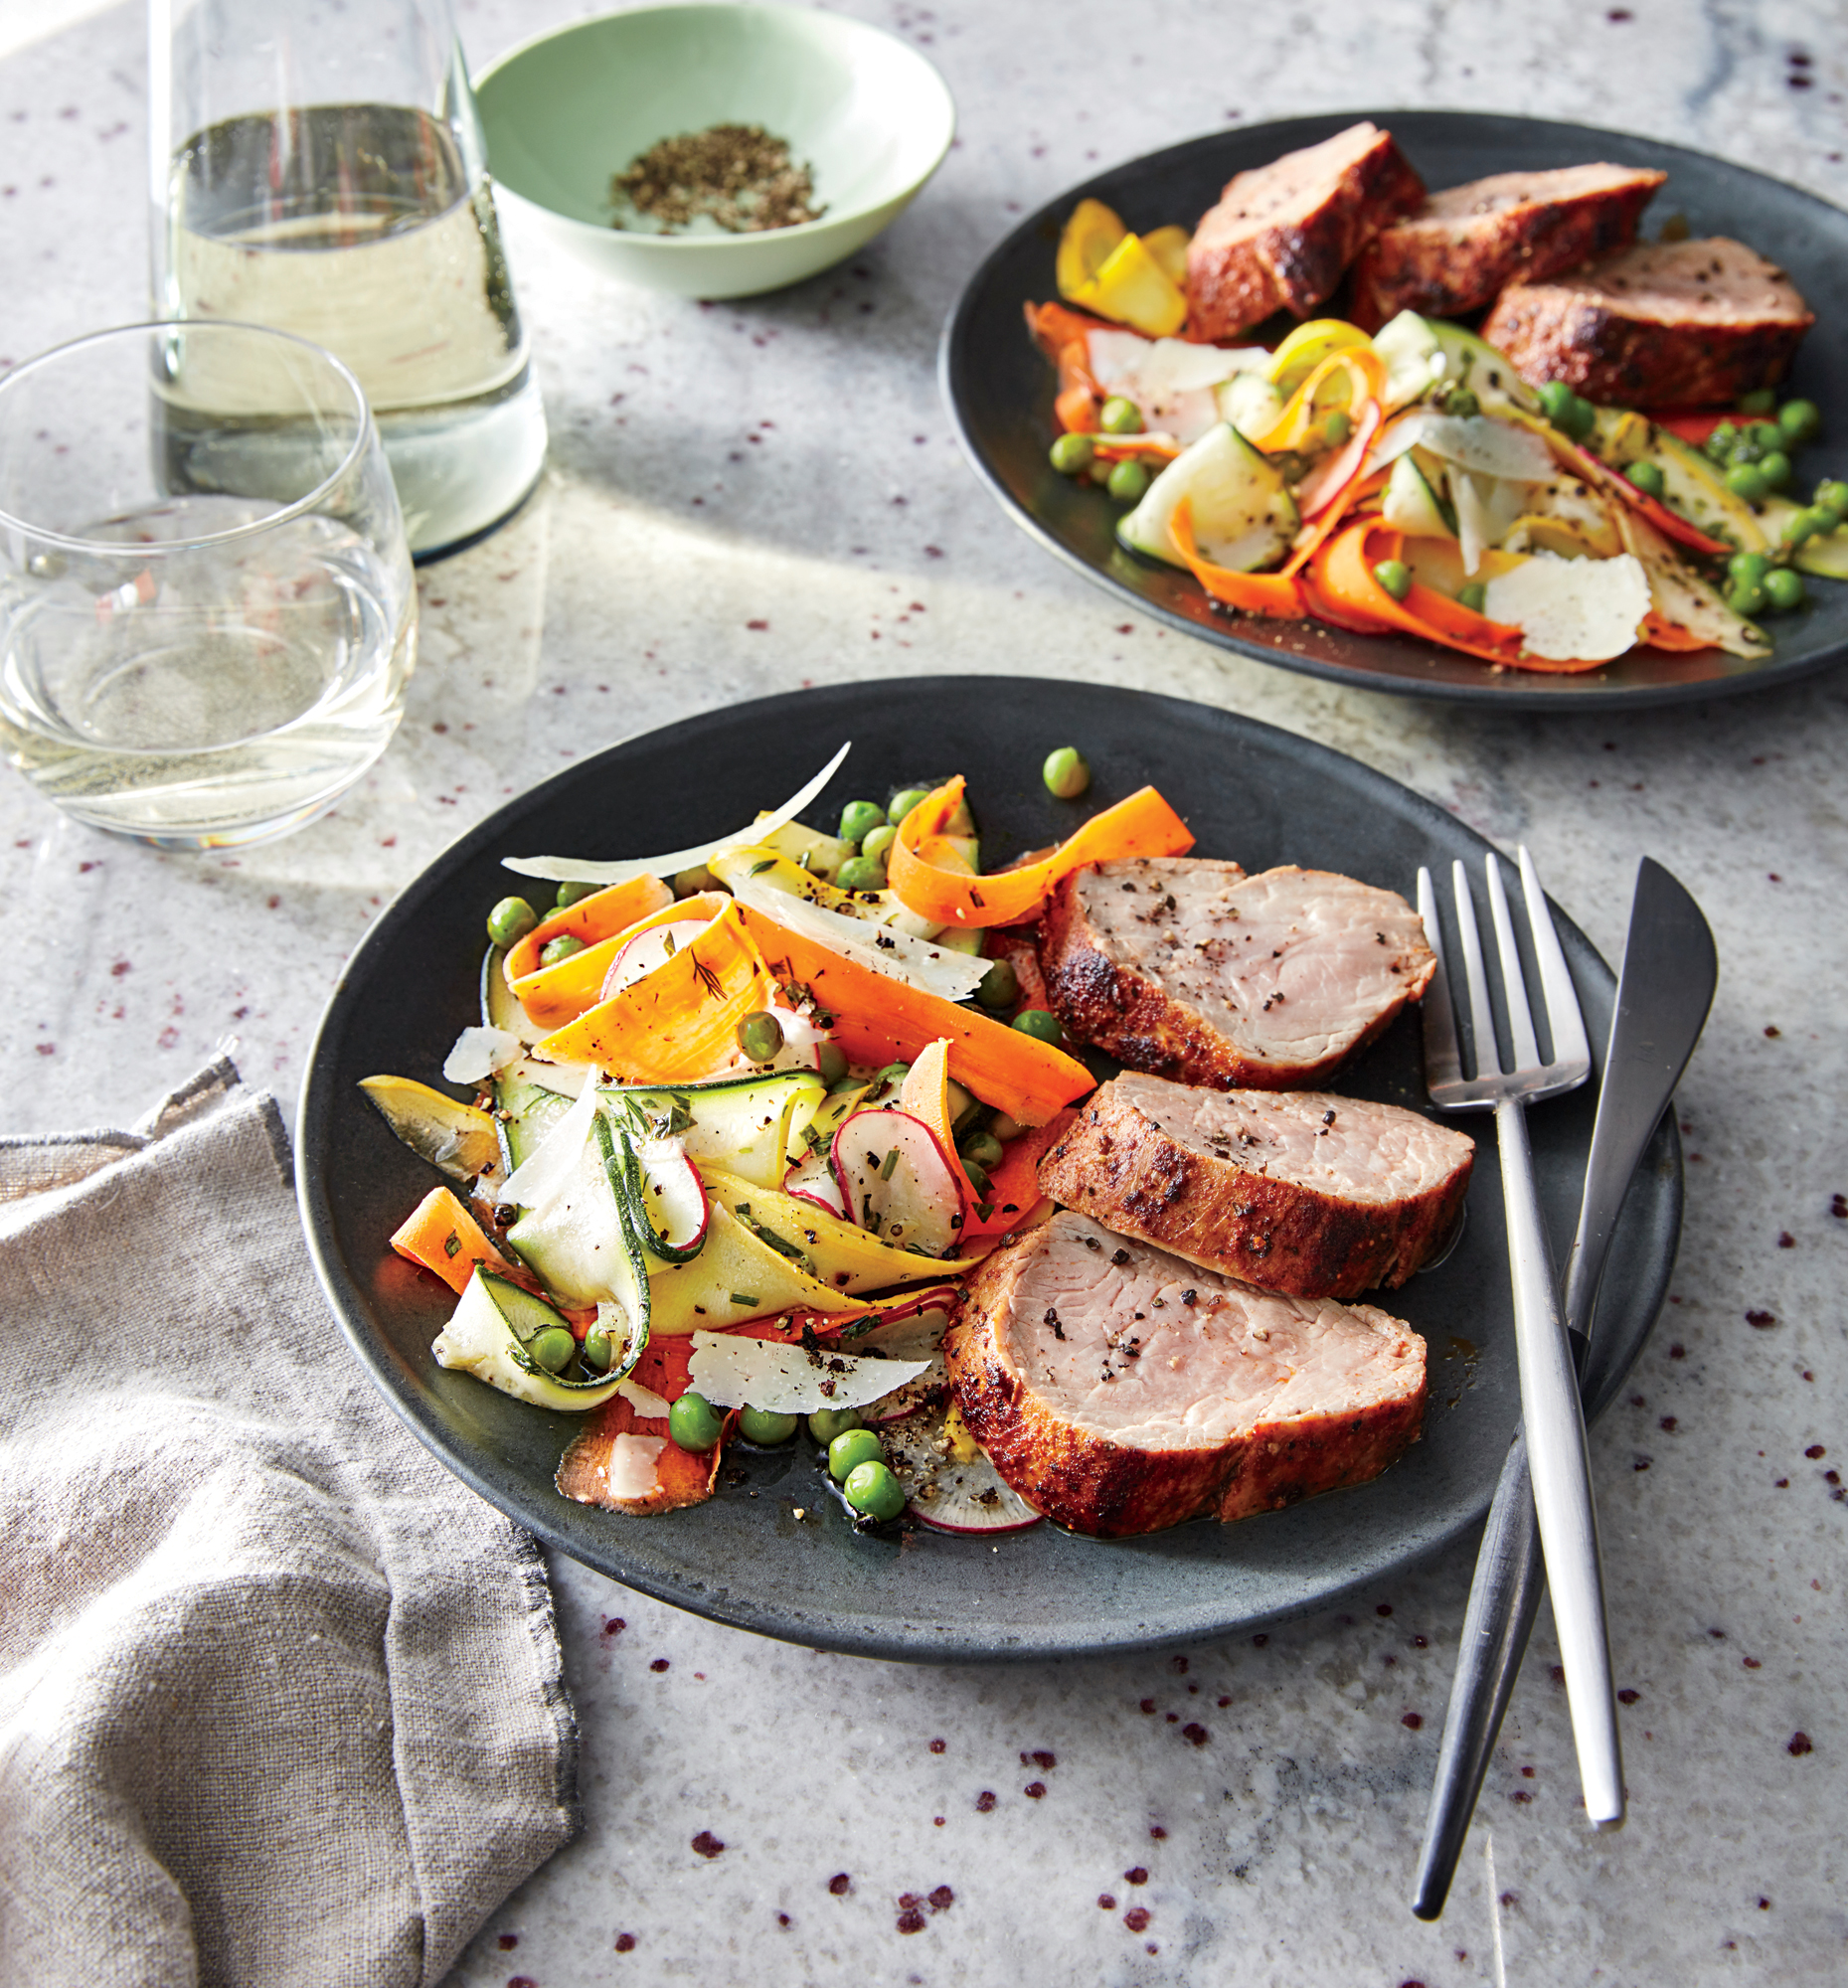 Pan-Roasted Pork with Baby Vegetable Salad